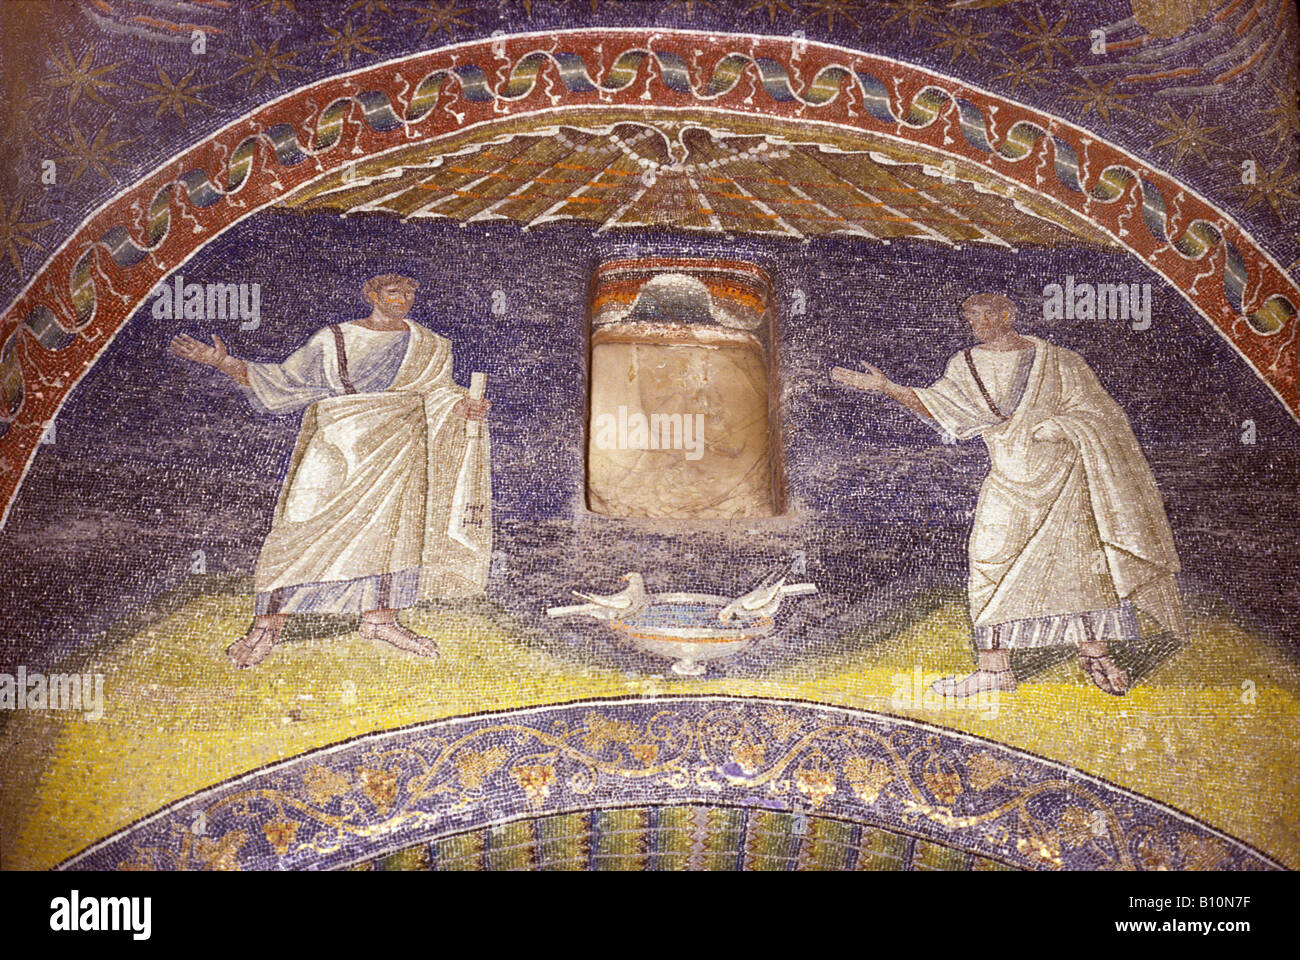 Ancient Art Architecture Collection Ltd Galla Placida Mausoleum mosaic Apostles Ravenna 5th c Italy - Stock Image